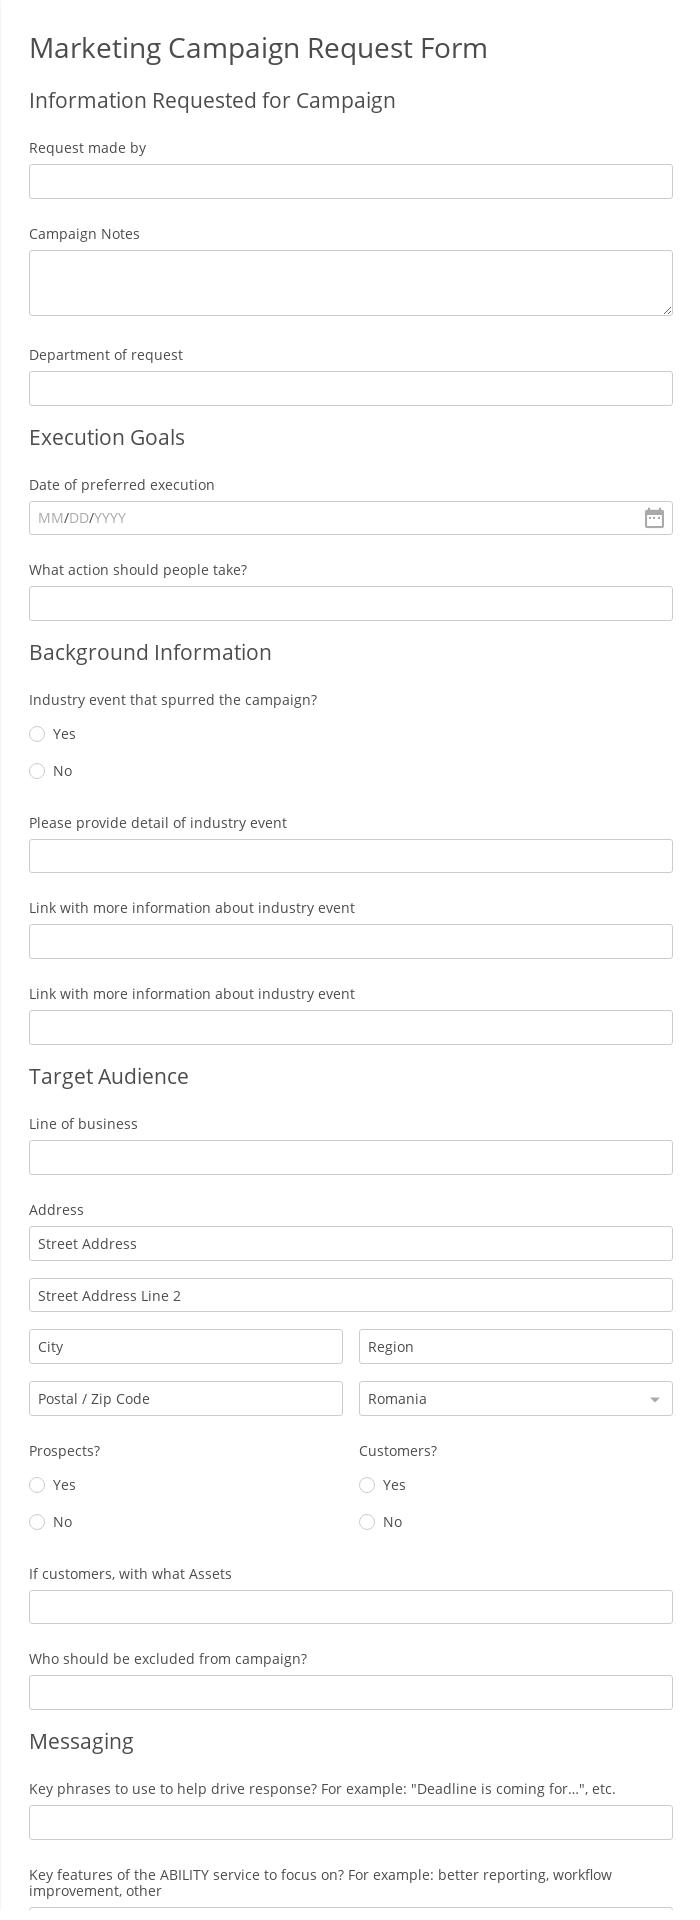 Marketing Campaign Request Form